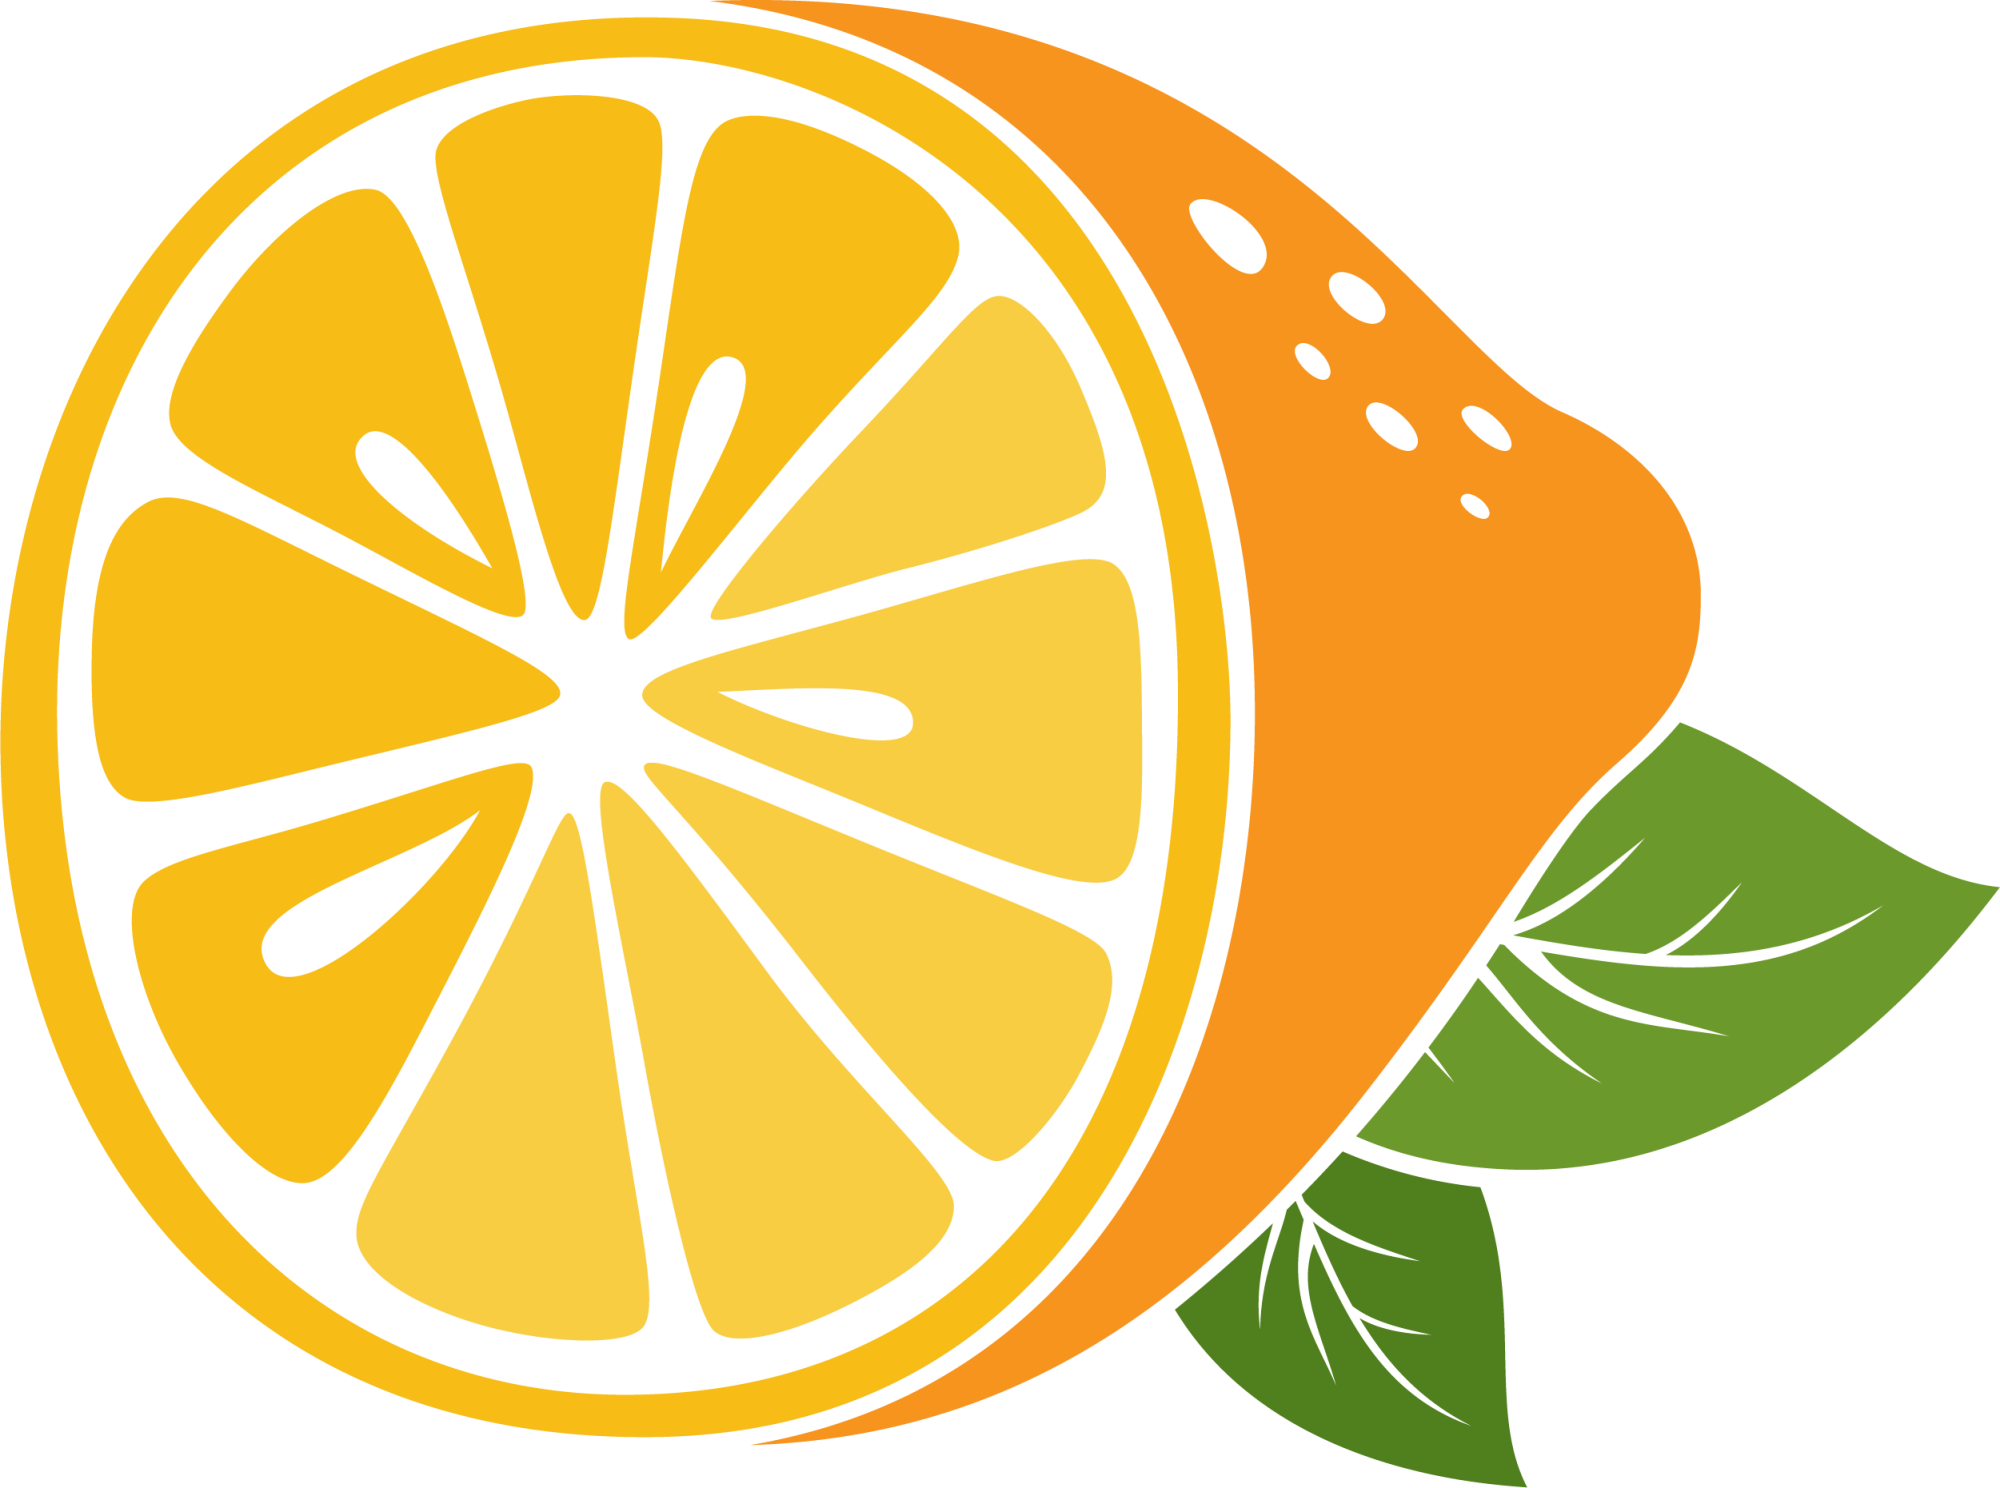 Lemons clipart kiwi. Lemon ford expedition xlt